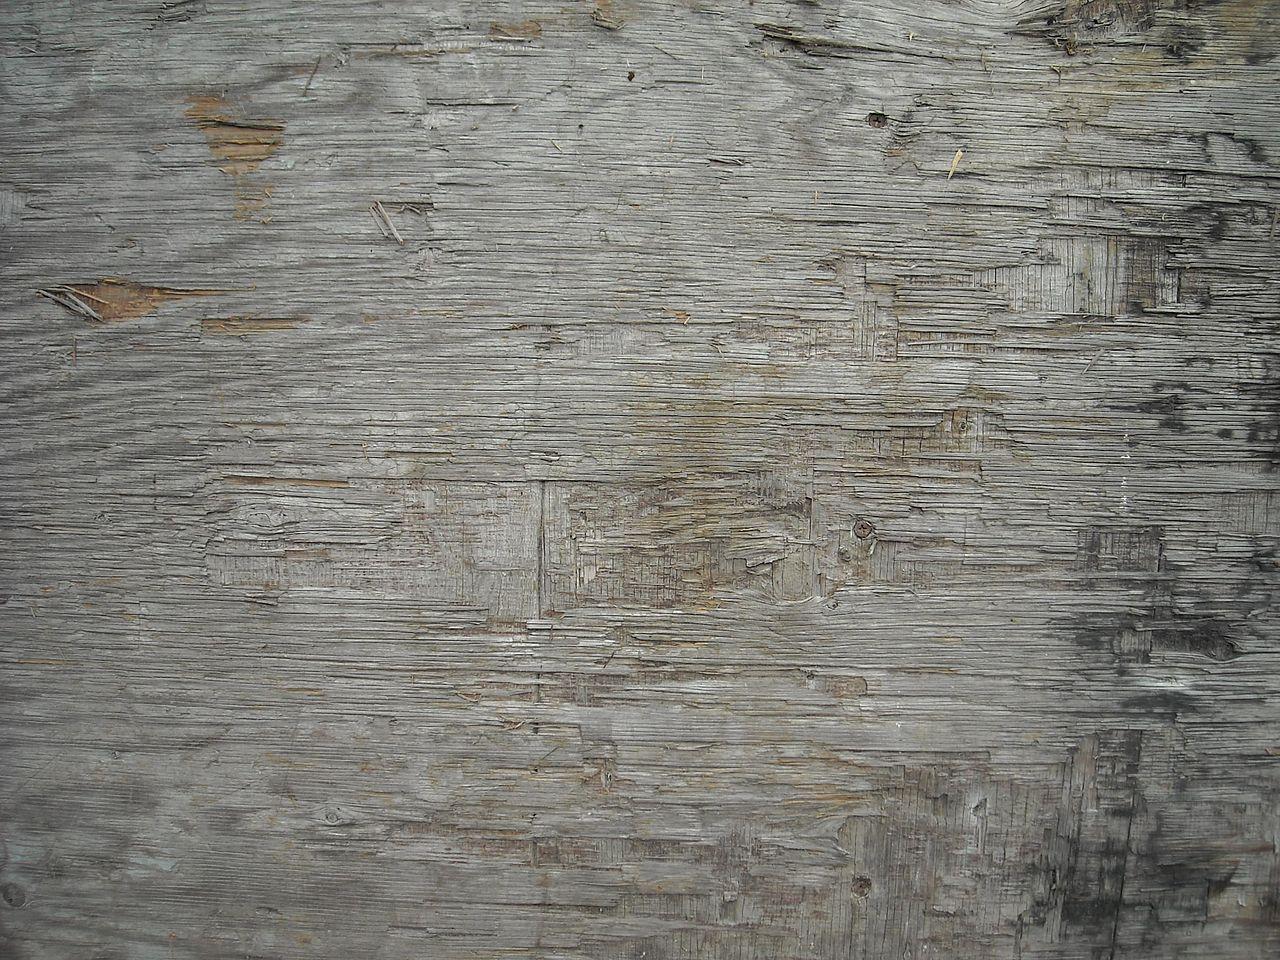 File:Creete background.jpg - Wikimedia Commons